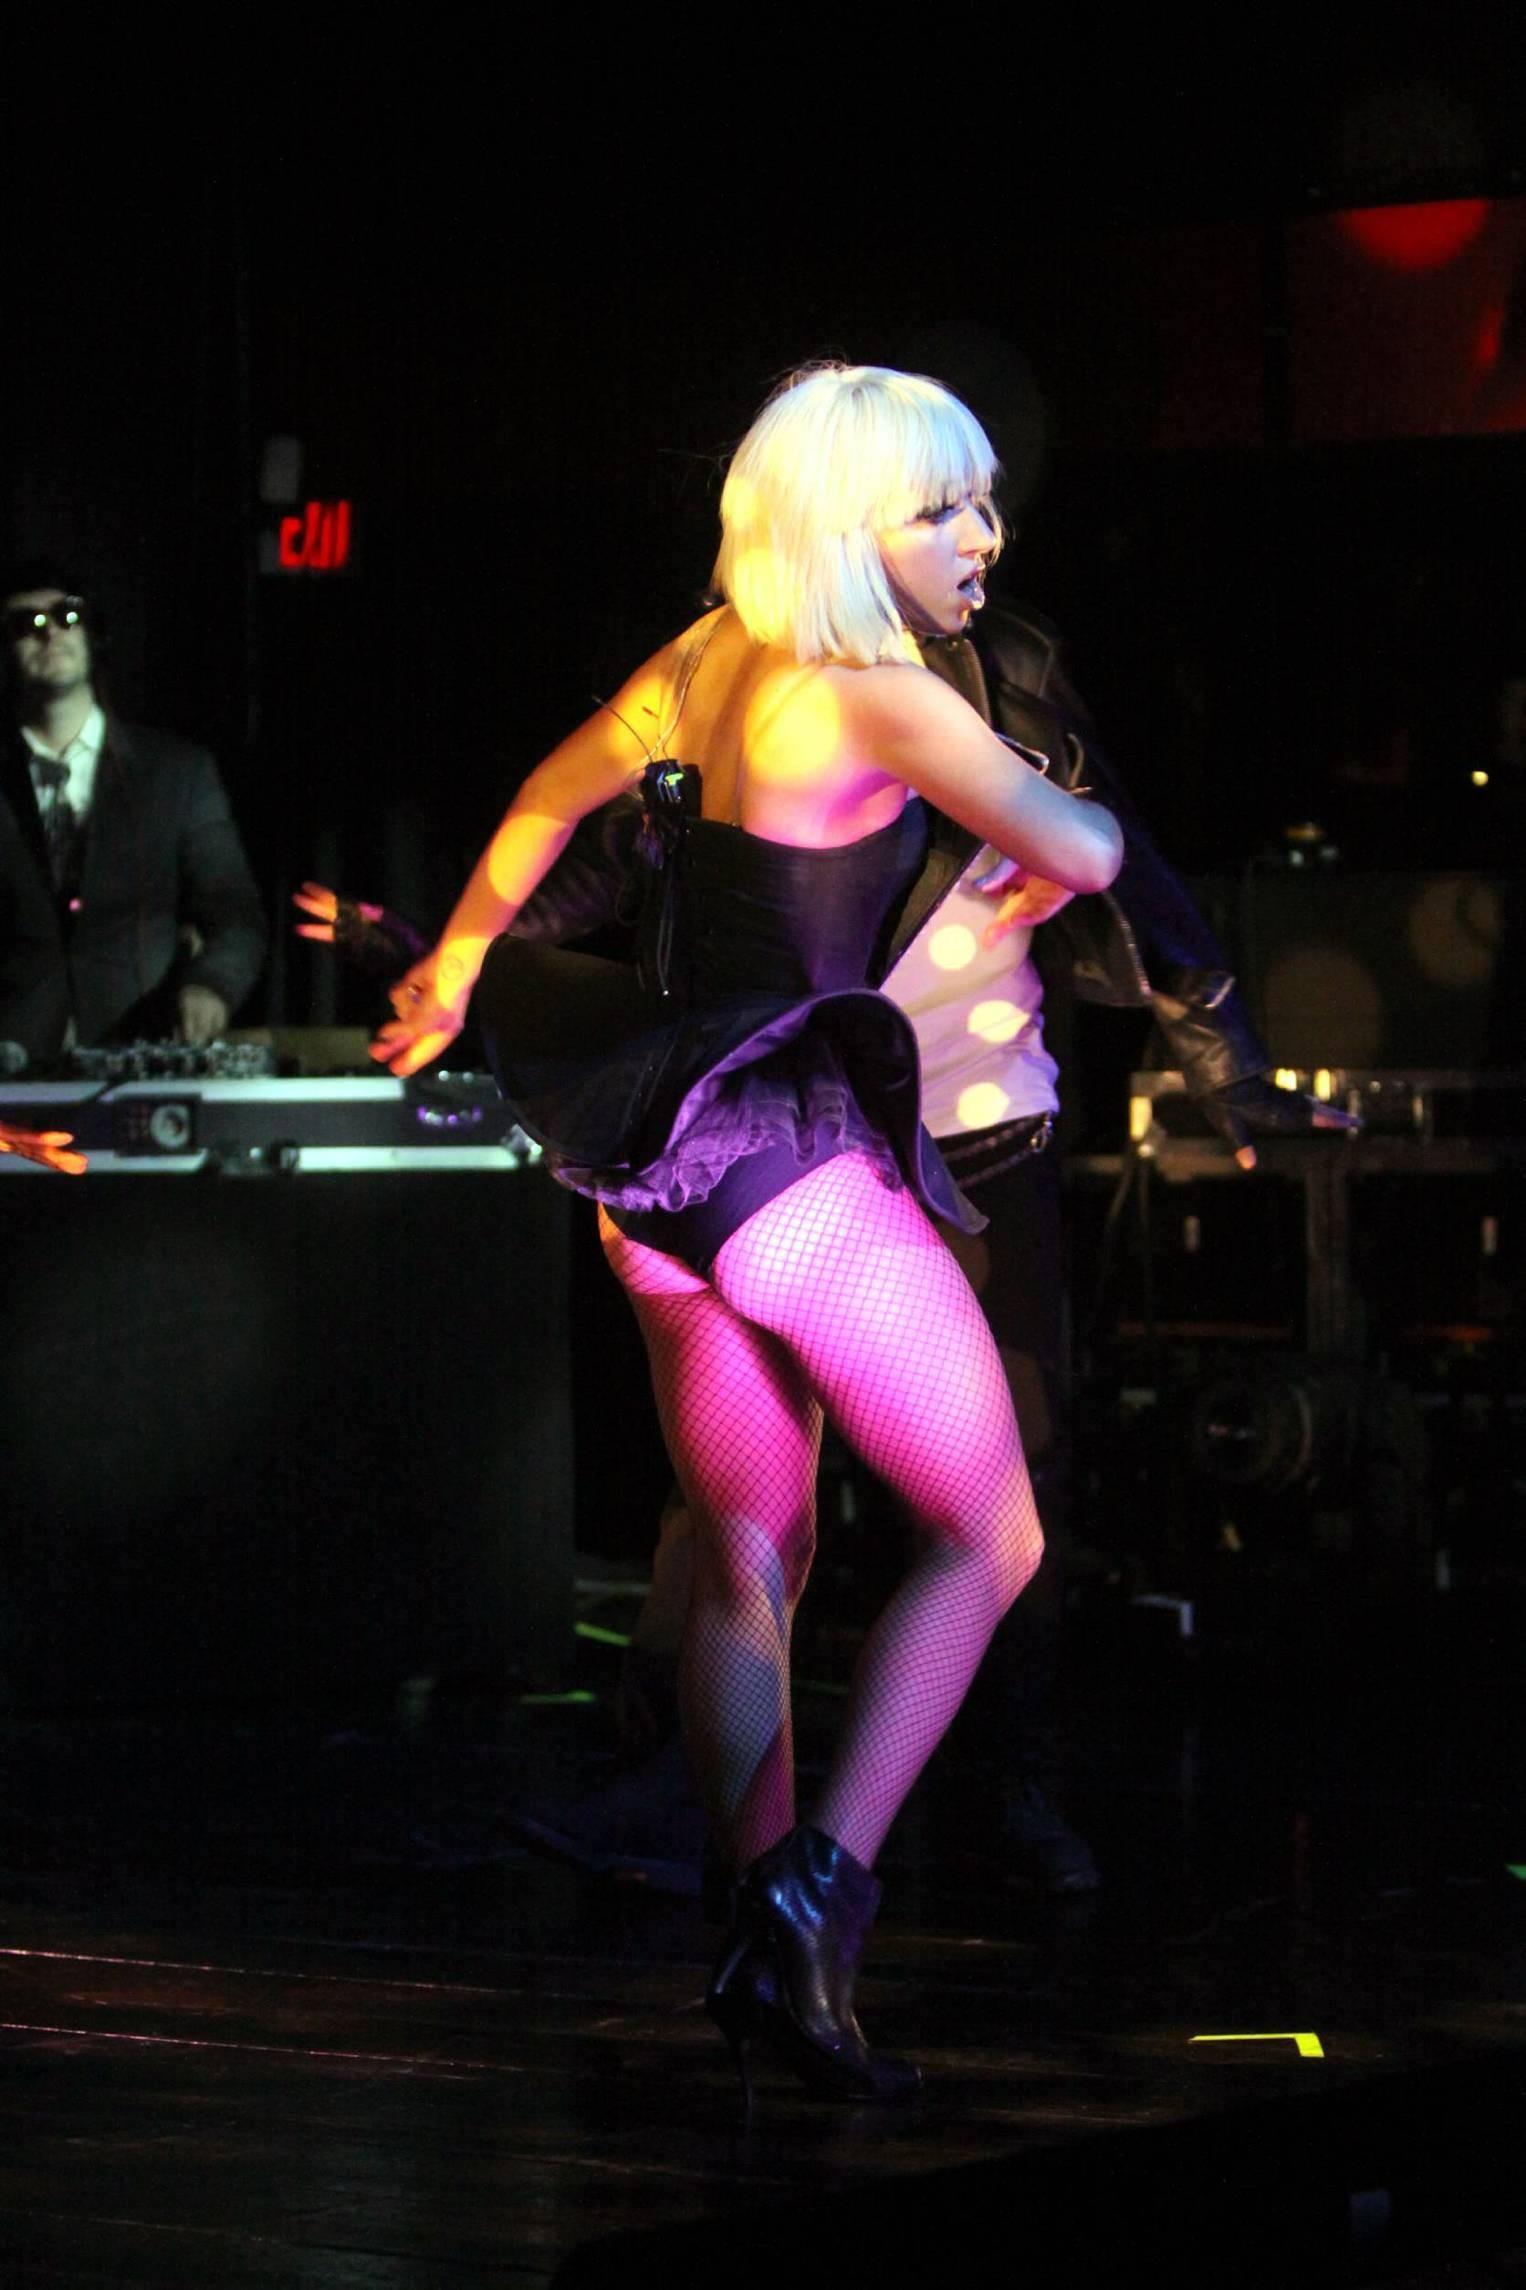 83962_Lady_GaGa_performs_at_Fort_Lauderdale-11_122_251lo.jpg